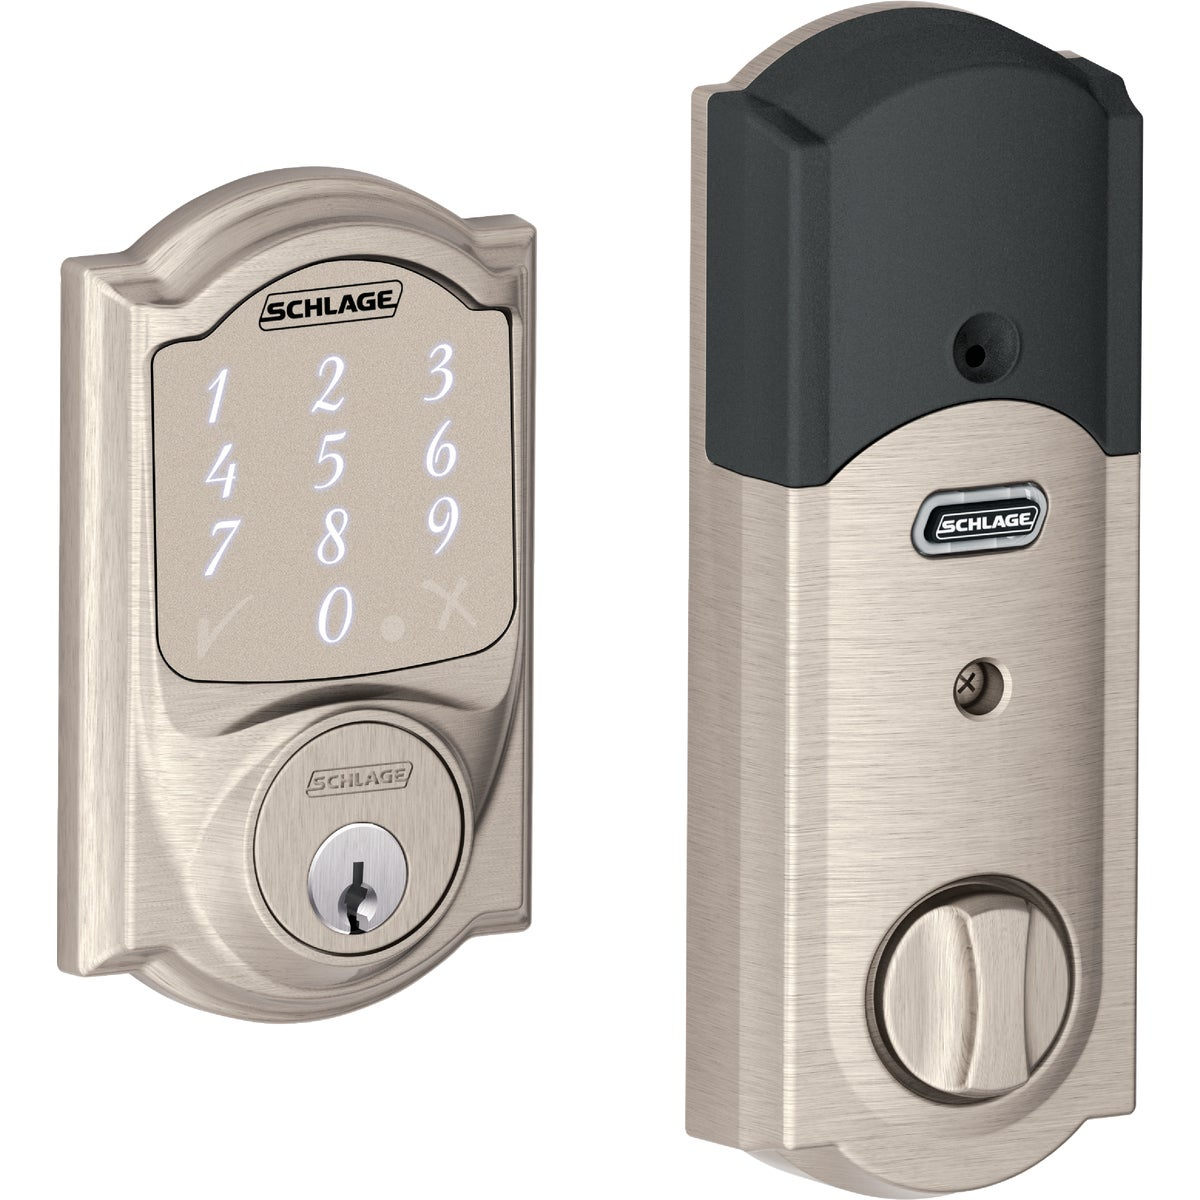 Schlage FB50NVSIE619 SN SIENA ENTRY COMBO Schlage Lock Company